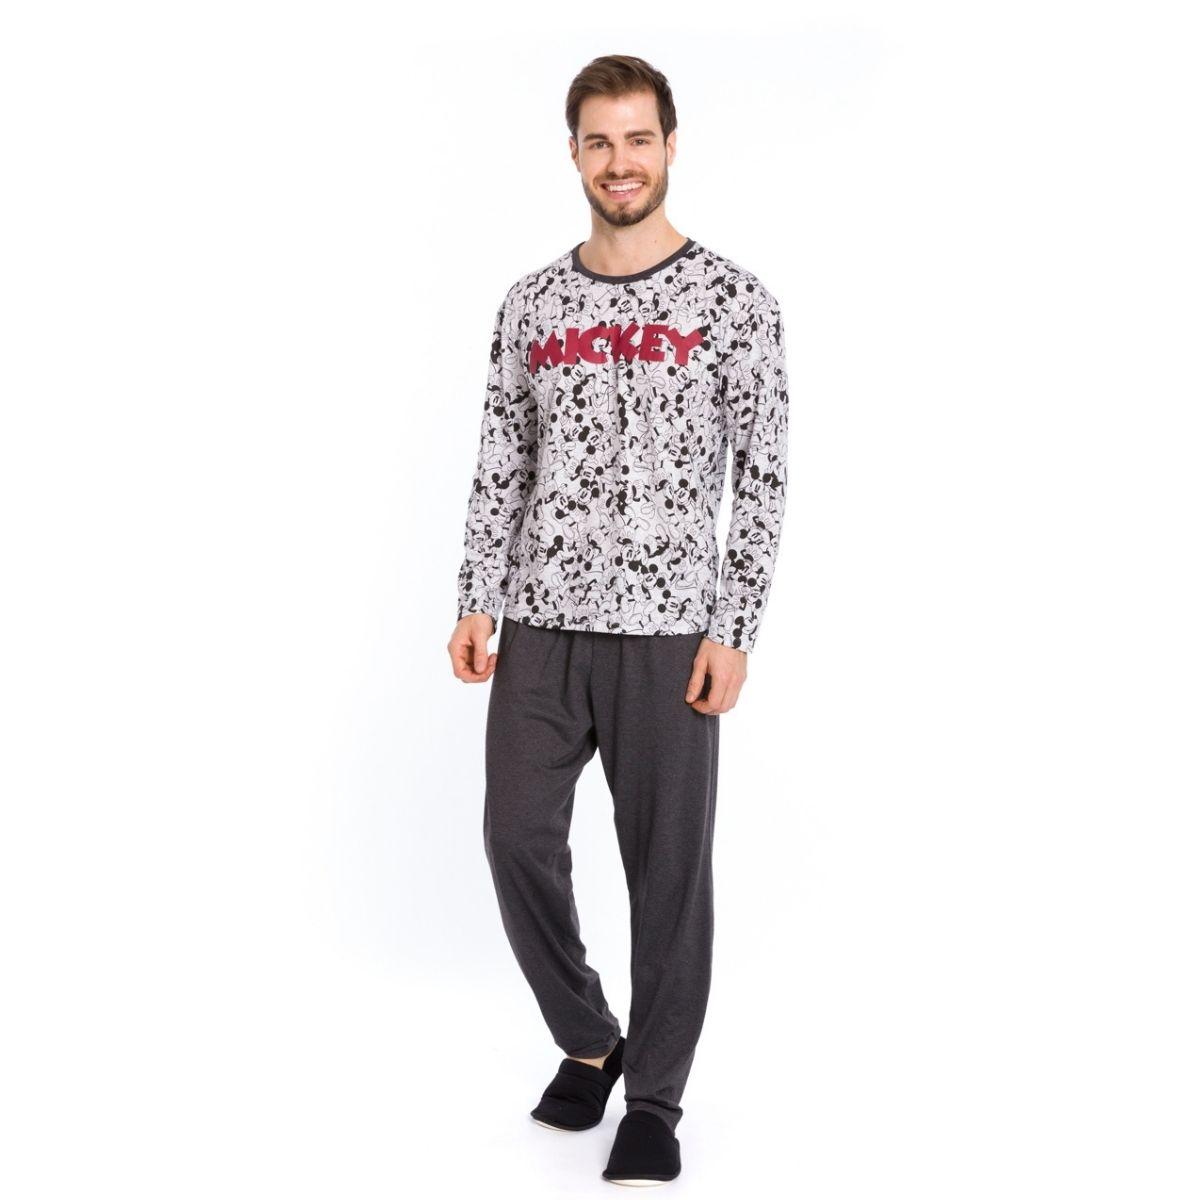 Pijama masculino do mickey  algodão frio chumbo